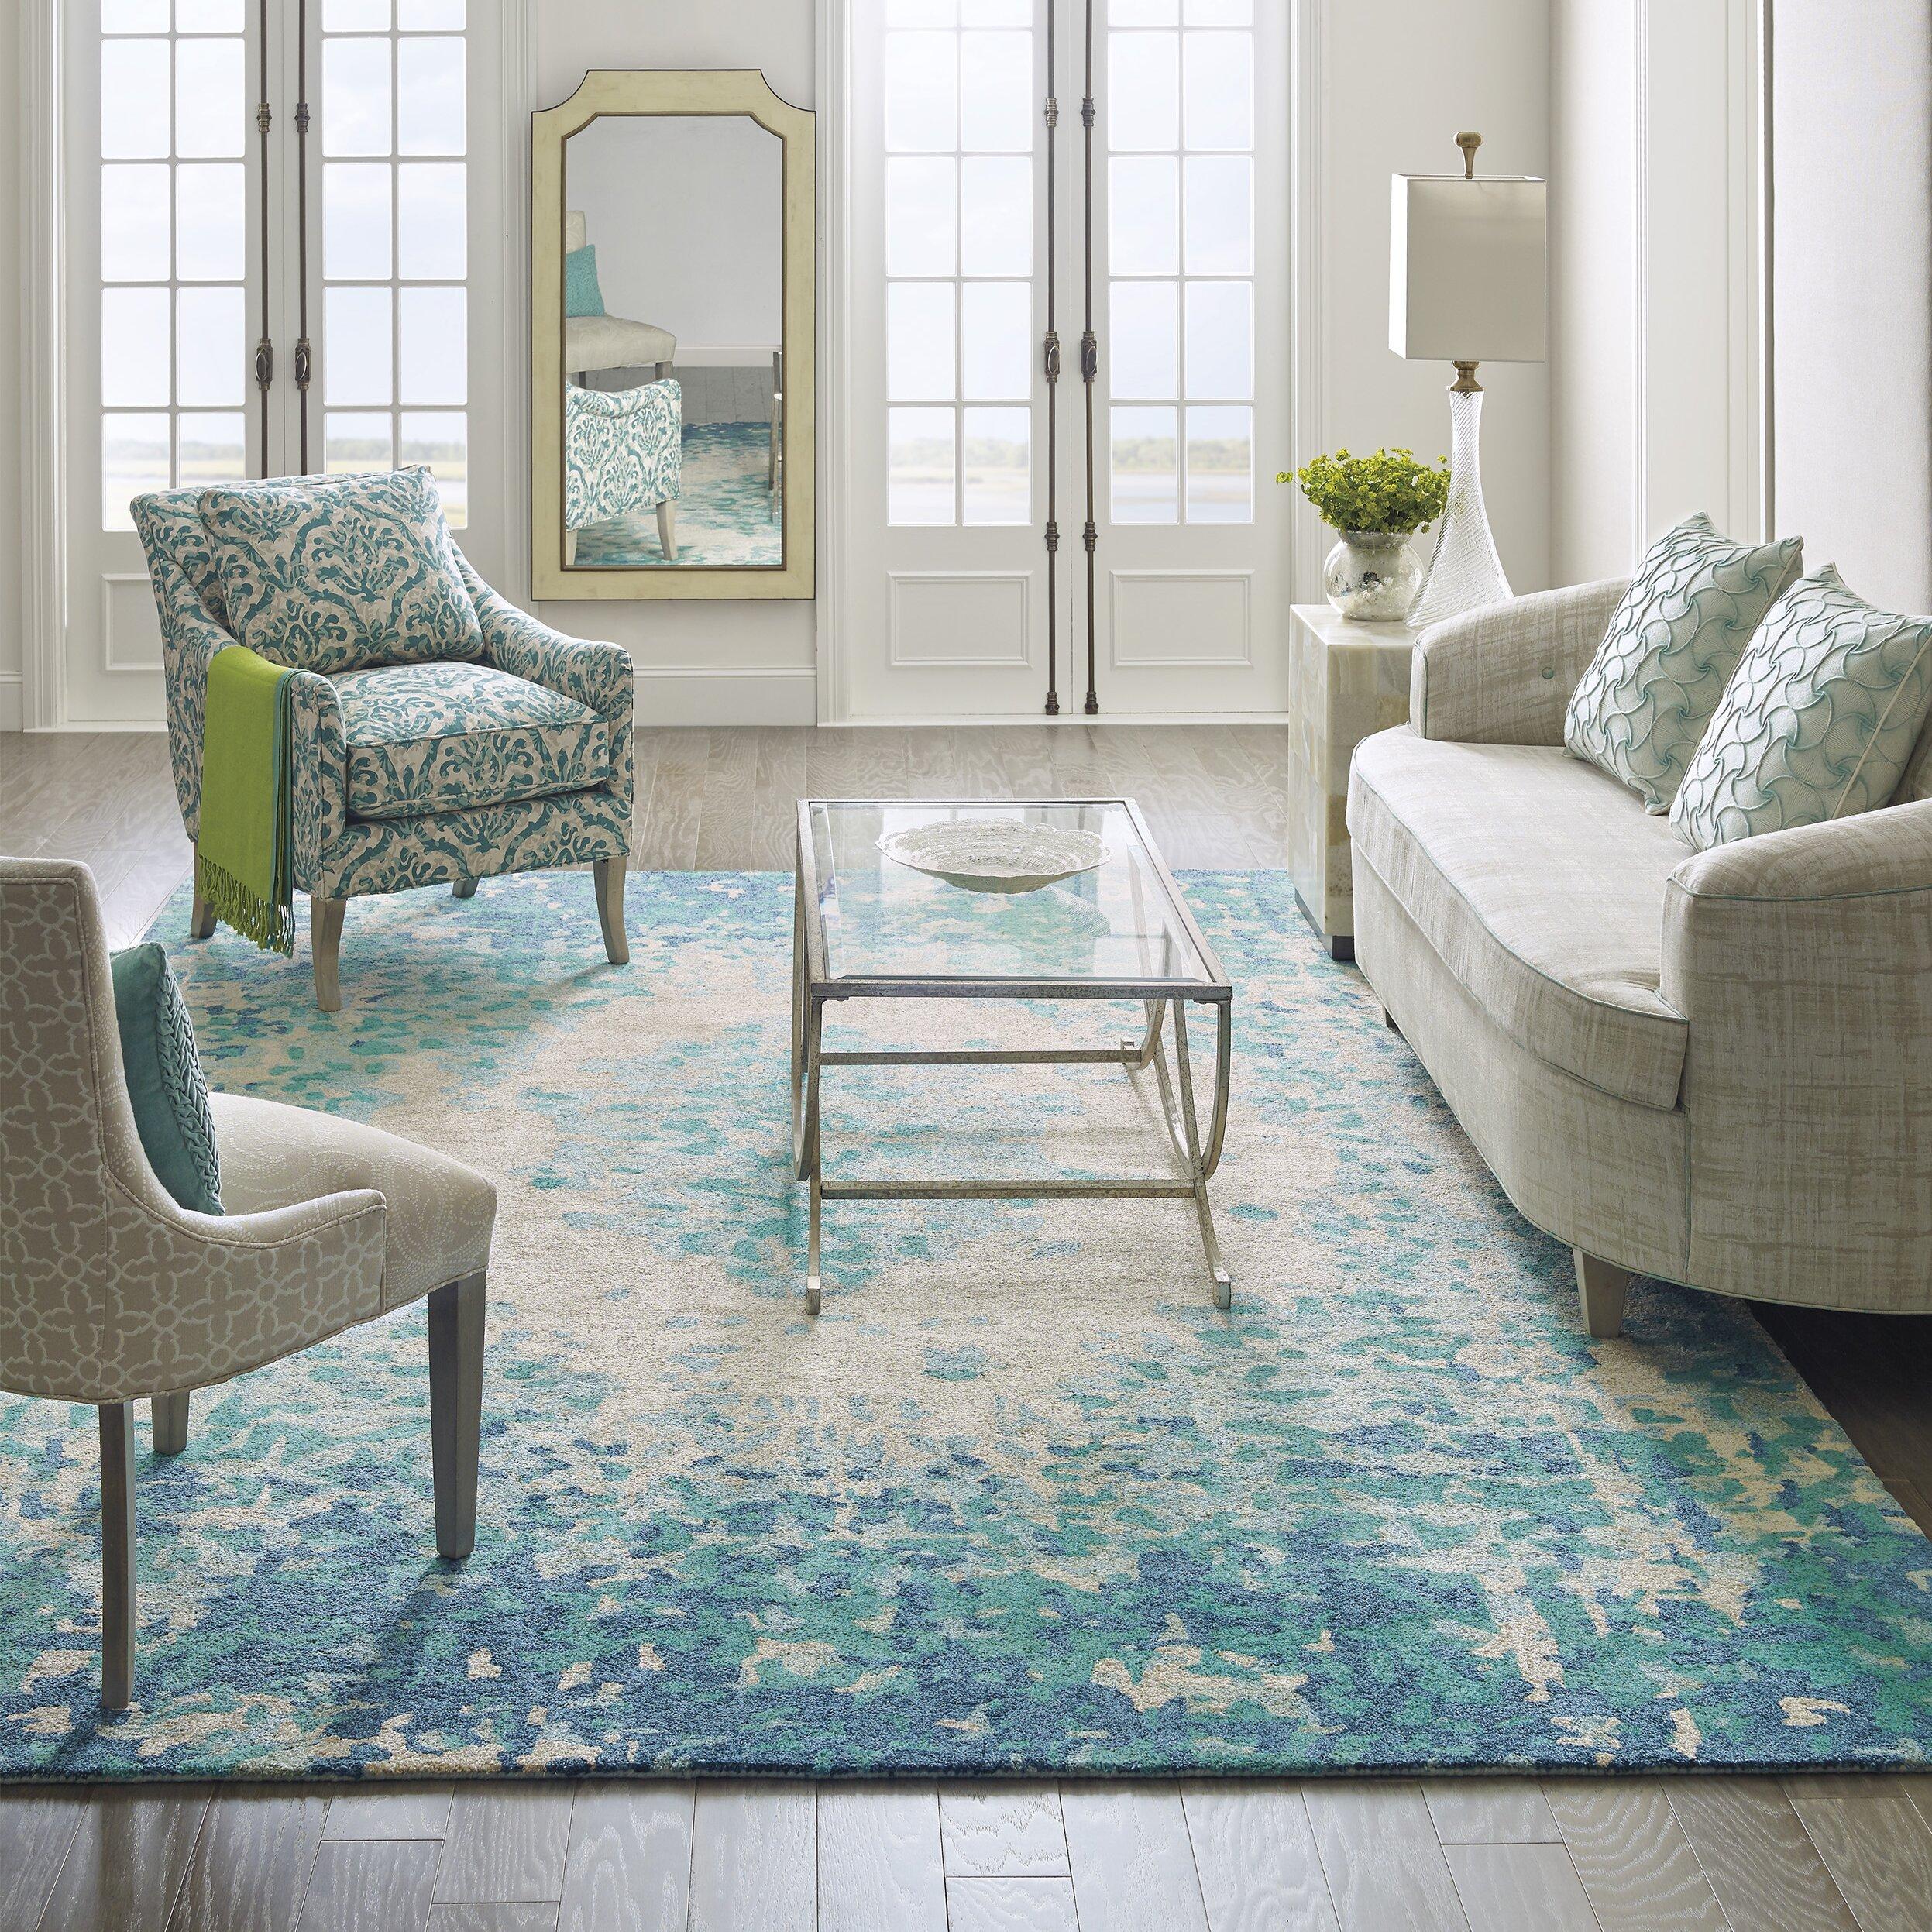 Company c looking glass hand tufted lake indoor area rug - Living room area rug ideas ...